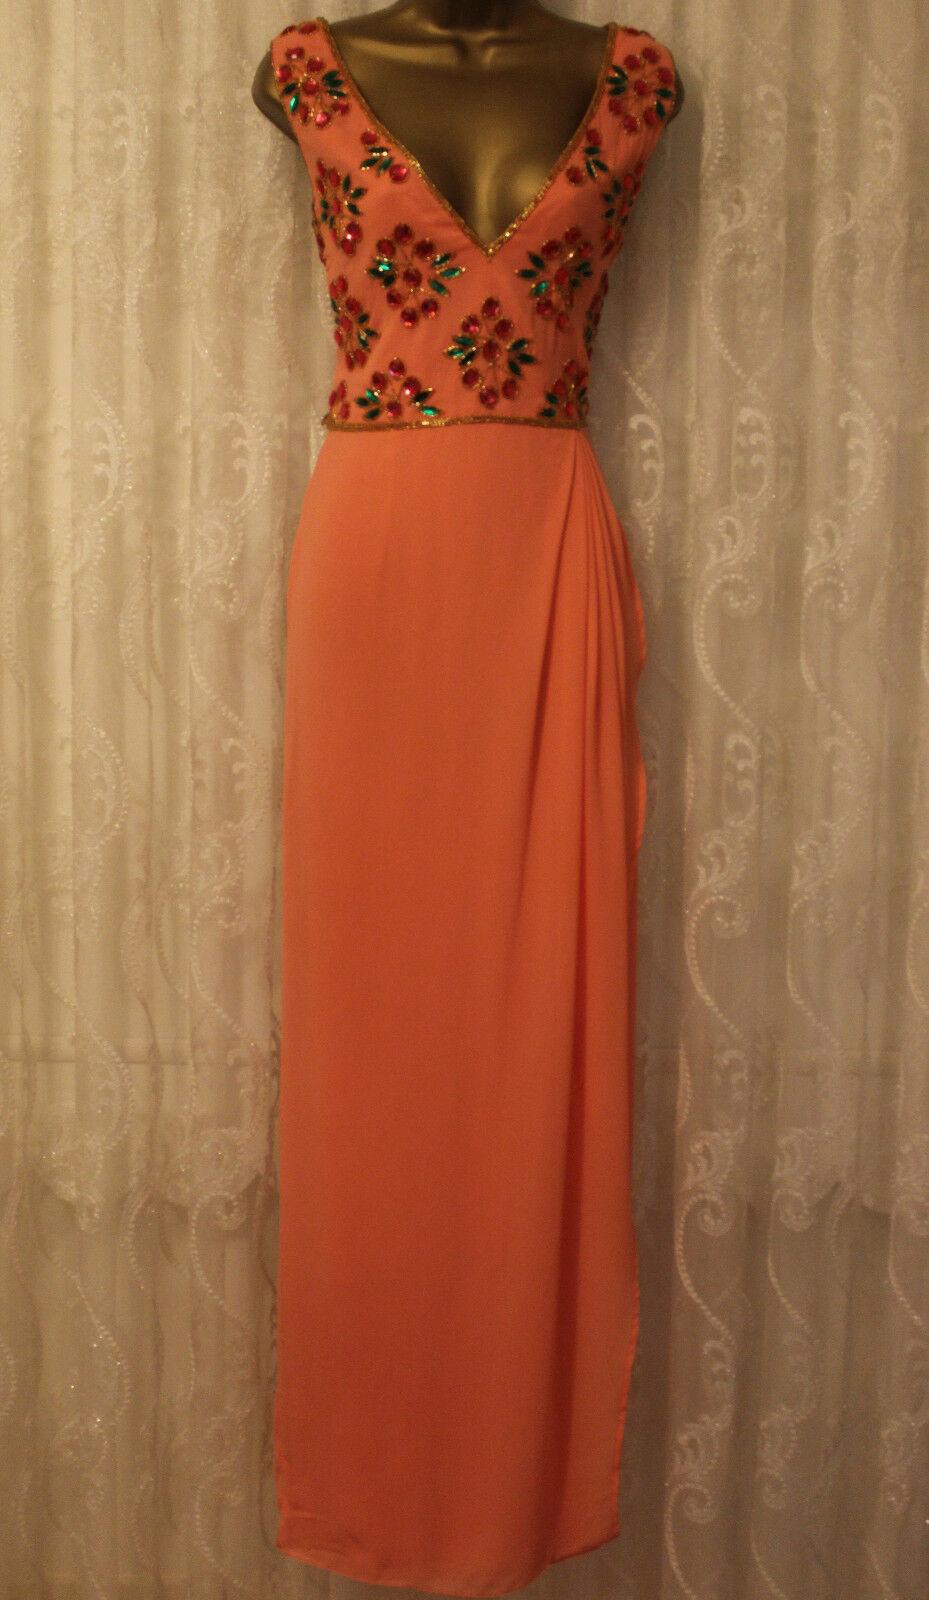 Virgos Lounge Peach Wrap Embellished Boho Maxi Occasion Party Dress & 12